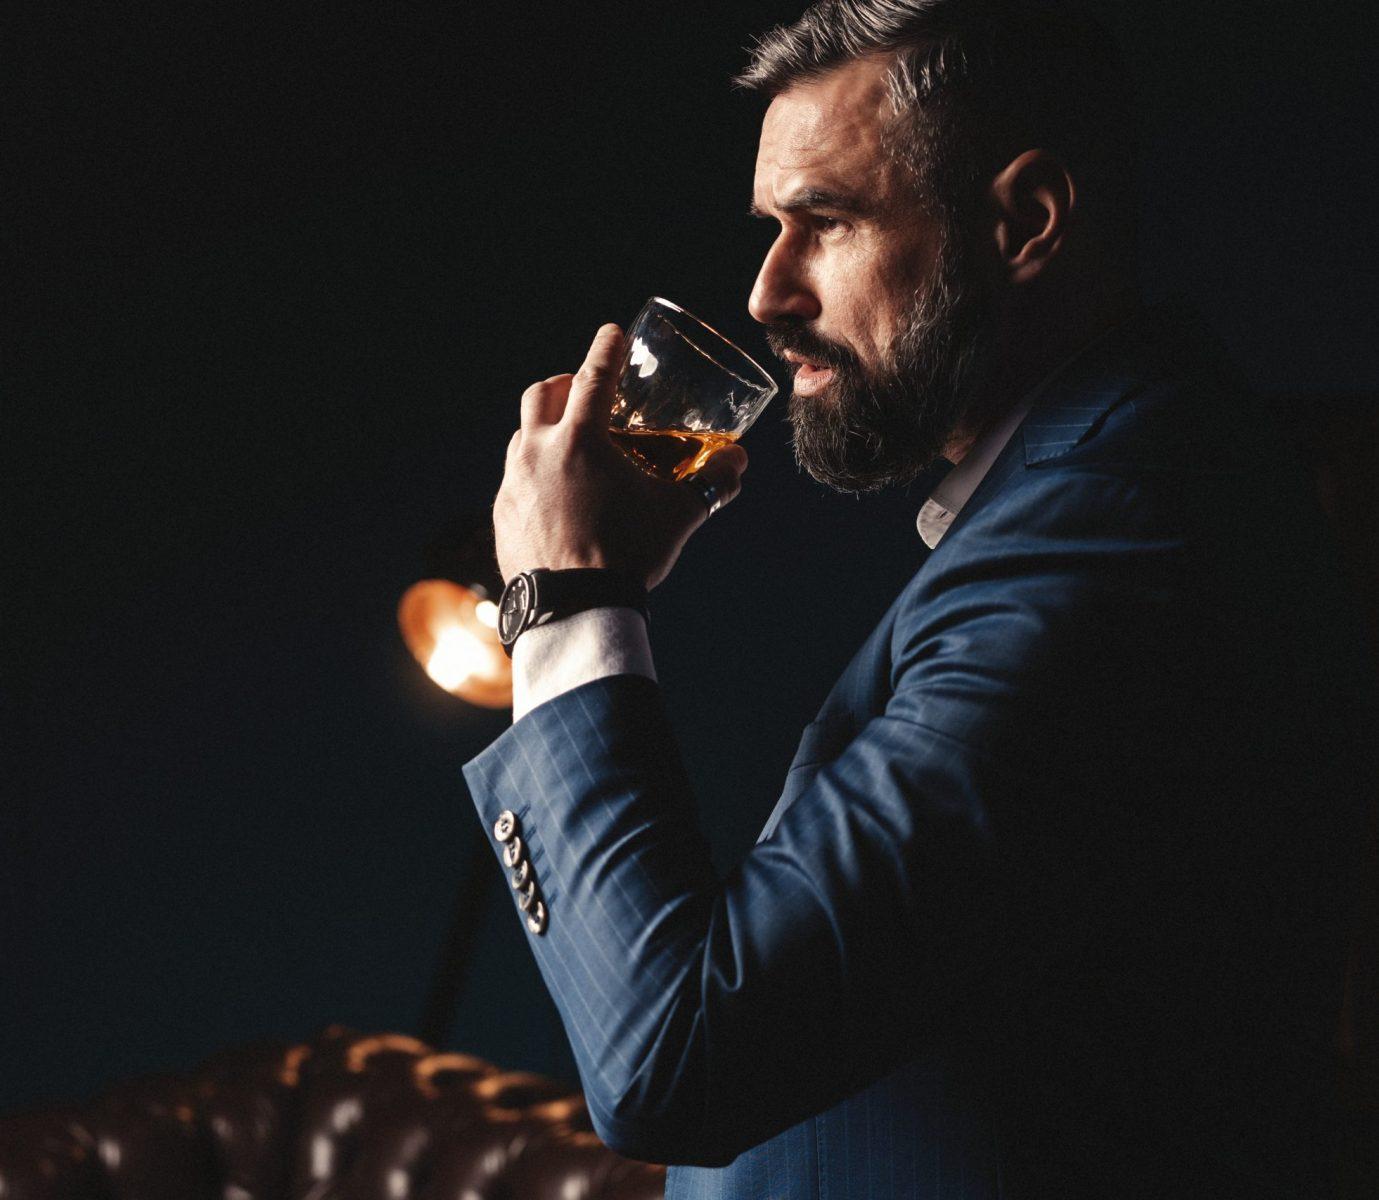 A dapper gent tasting whiskey